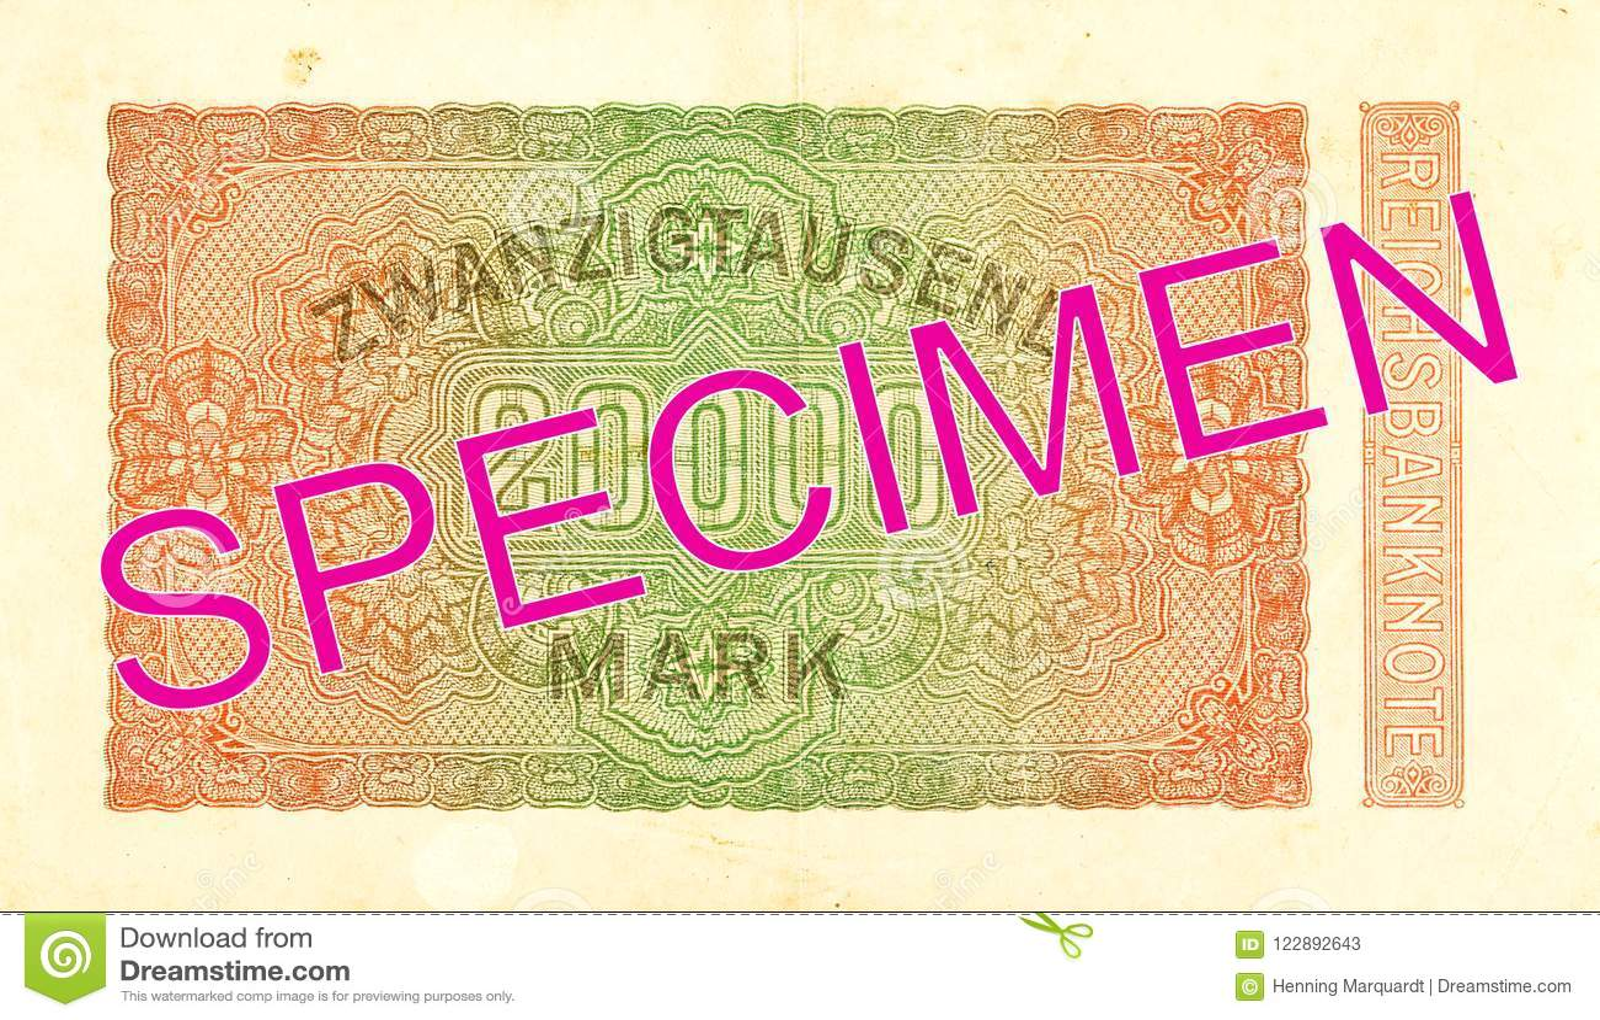 20000 inverse du billet de banque 1923 de mark de royaume